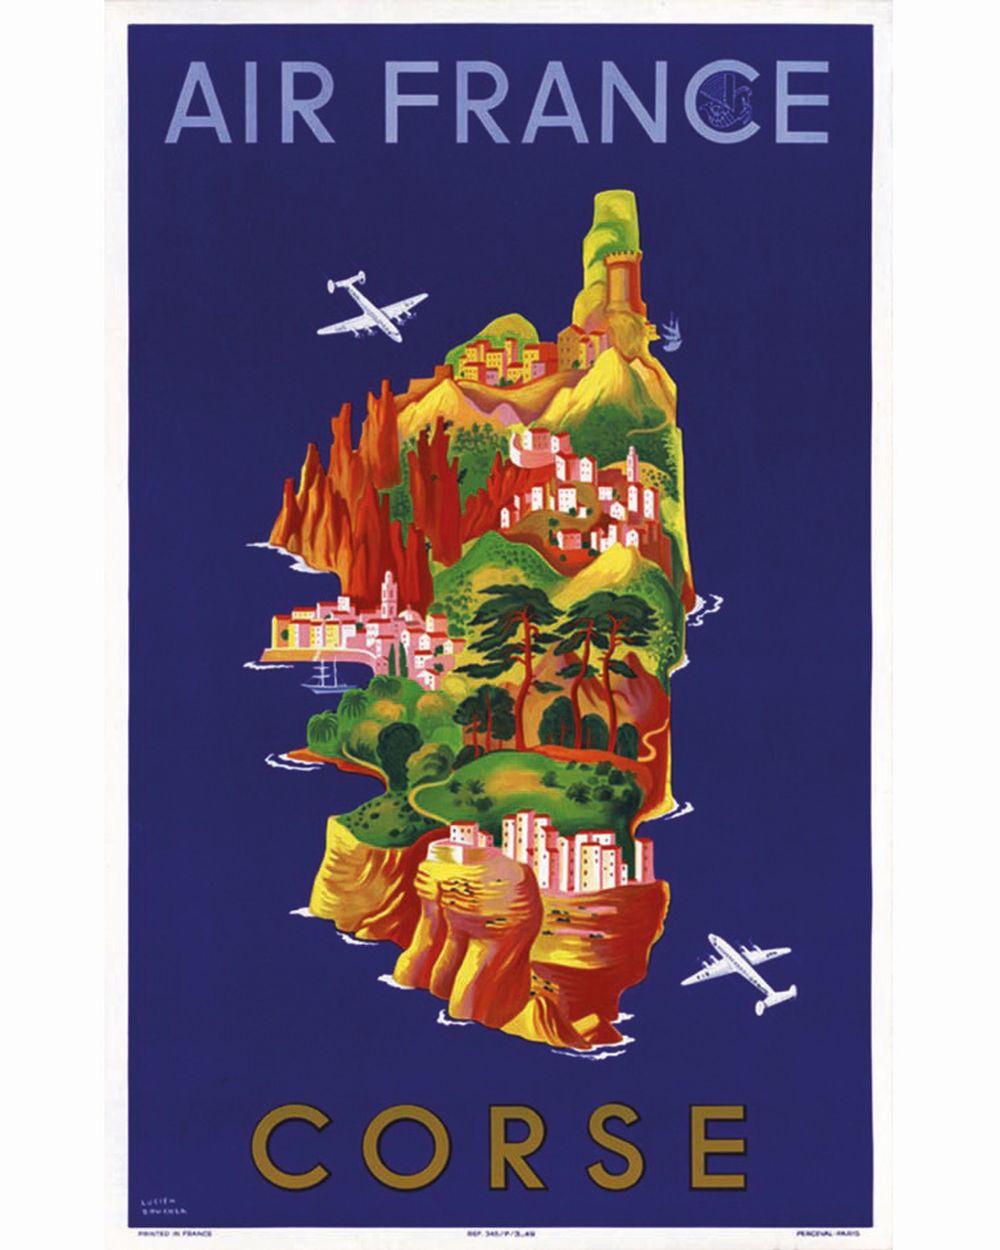 BOUCHER LUCIEN - Corse Air France     1949